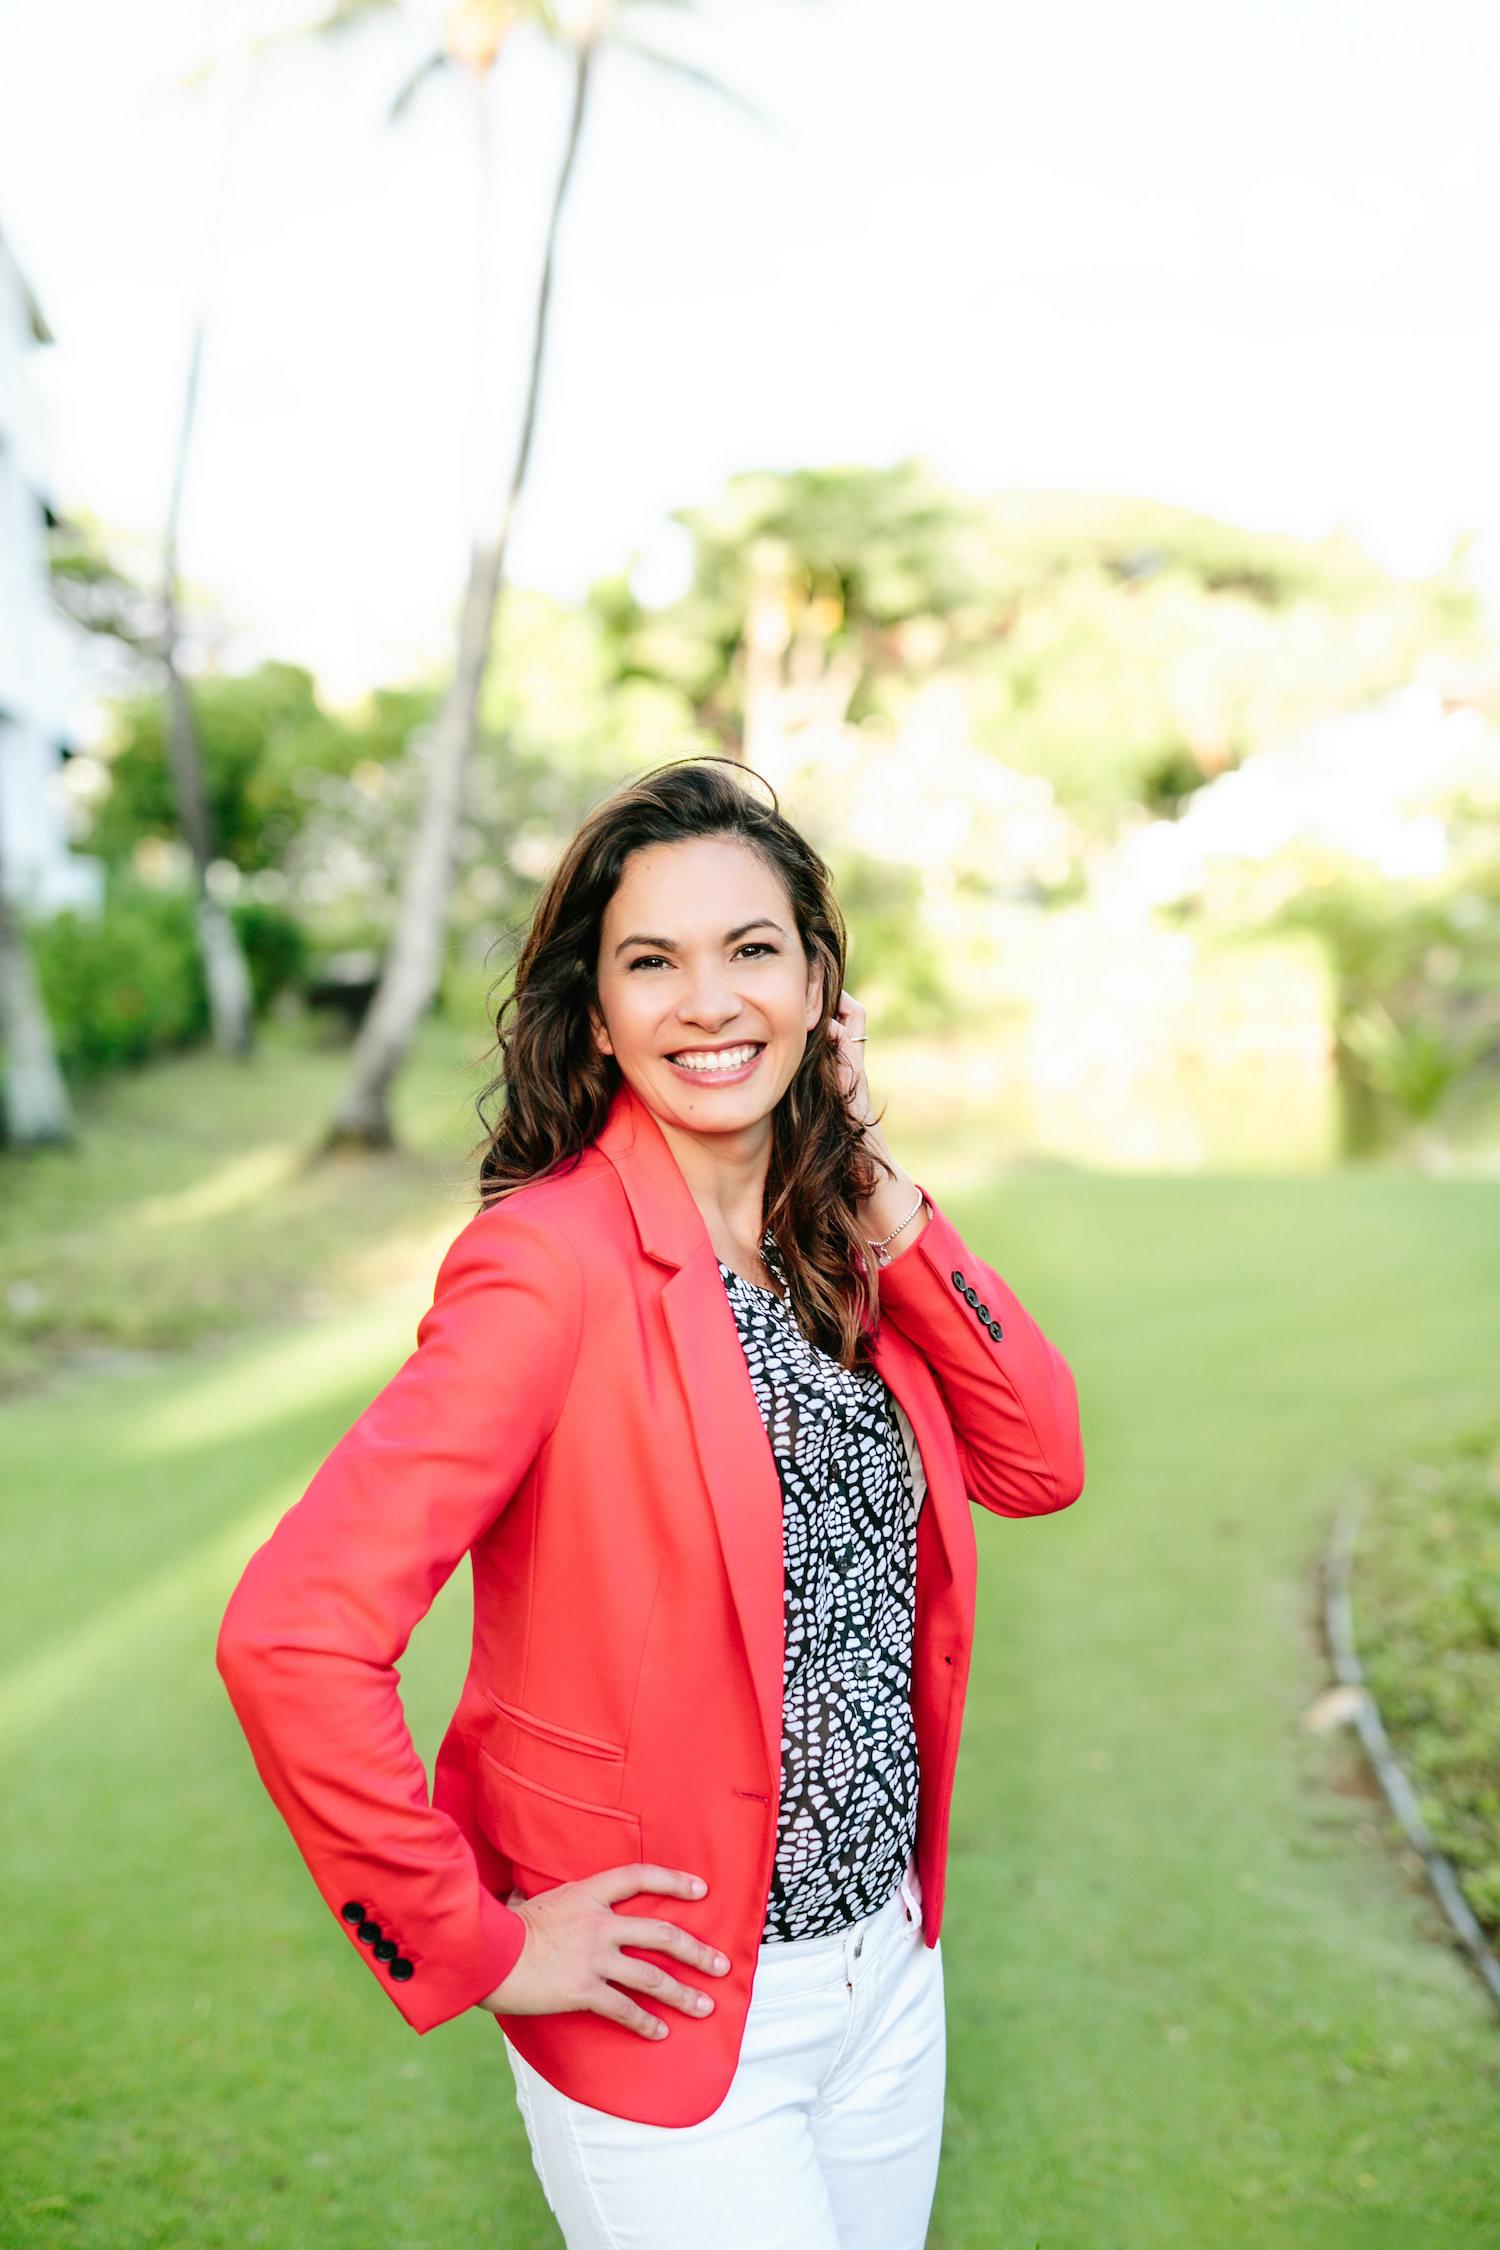 Dara Perreira business coach from Hawaii